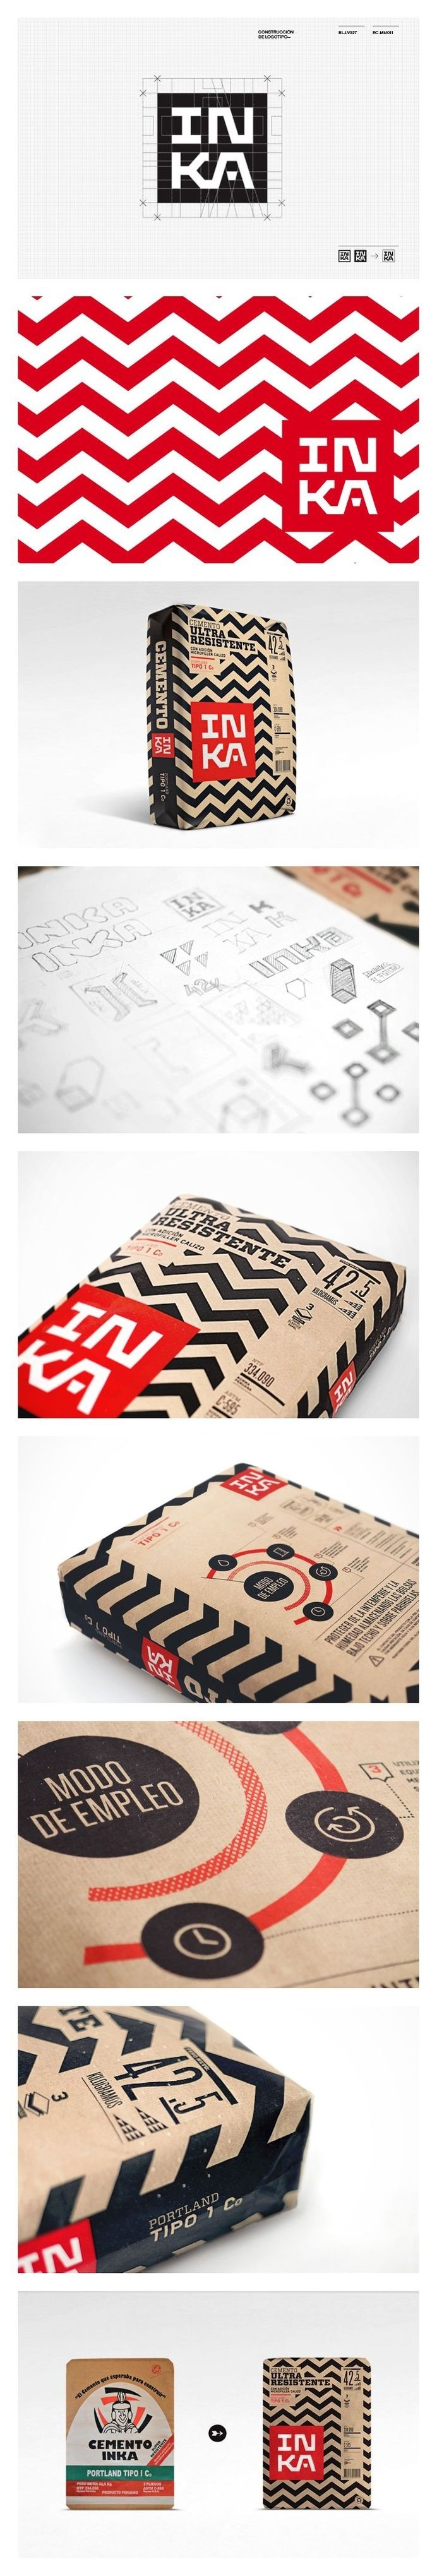 Cementos Inka gorgeous #packaging #design #graphic #identity